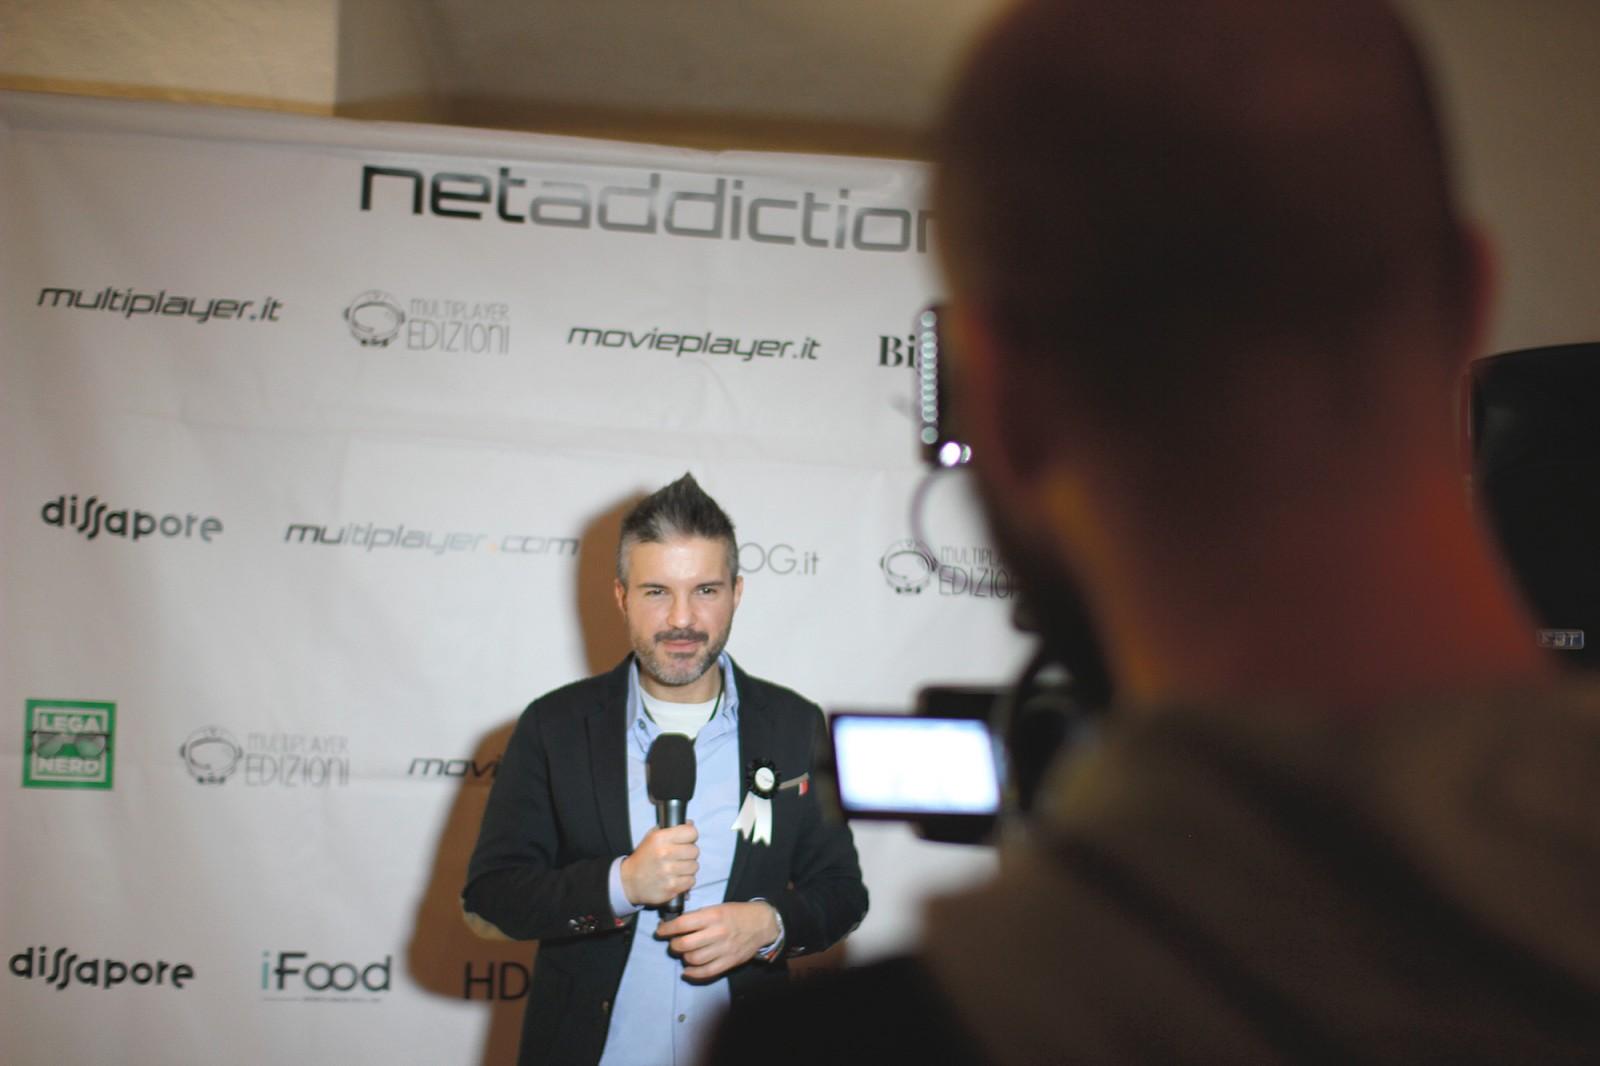 NetAddiction_on_the_Rock_00107